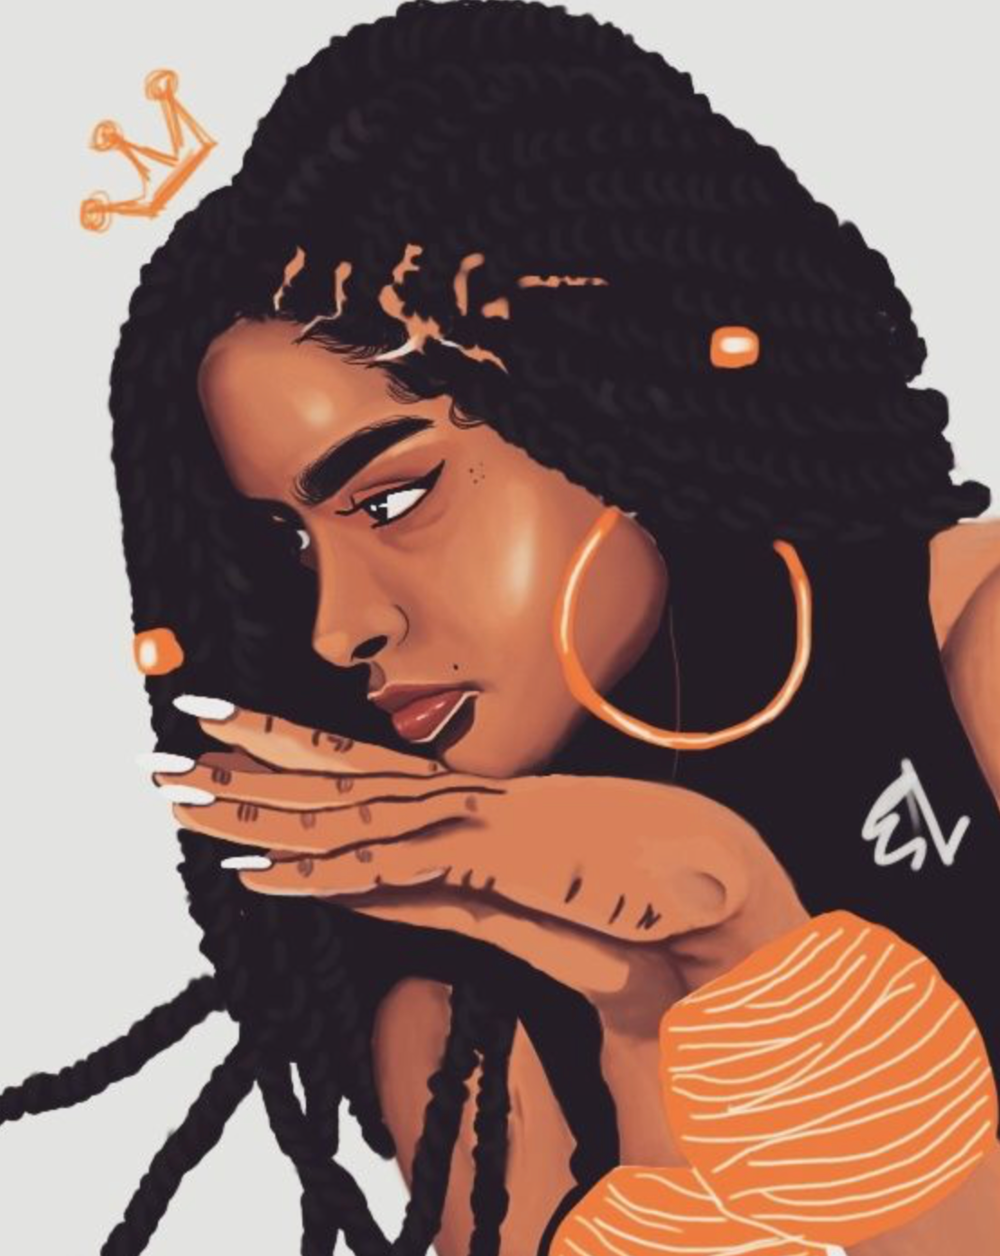 Black Girl Magic — Soul Skin Glow in 2020 Black women art